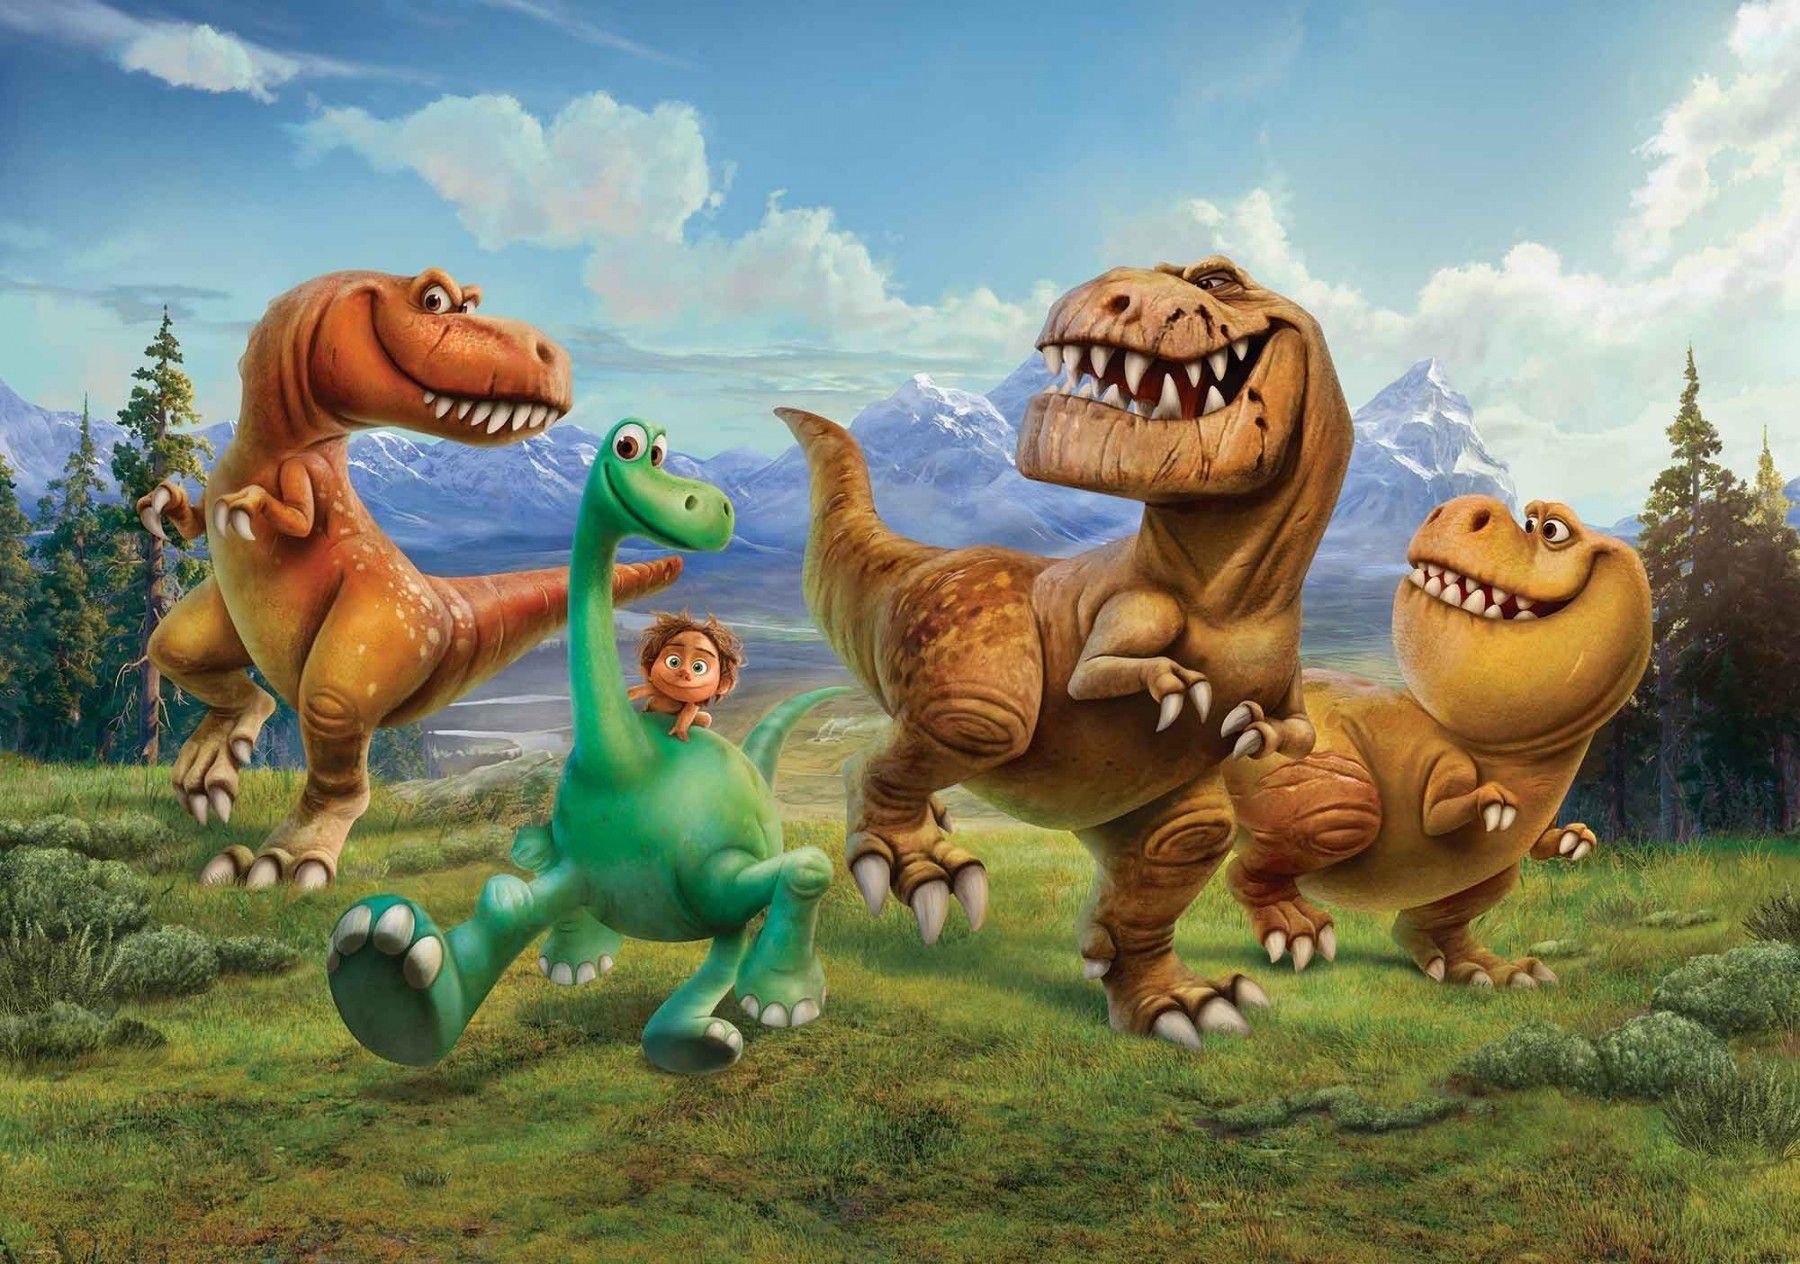 Cartoon dinosaur wallpapers top free cartoon dinosaur backgrounds wallpaperaccess - Paperboy dinosaur wallpaper ...